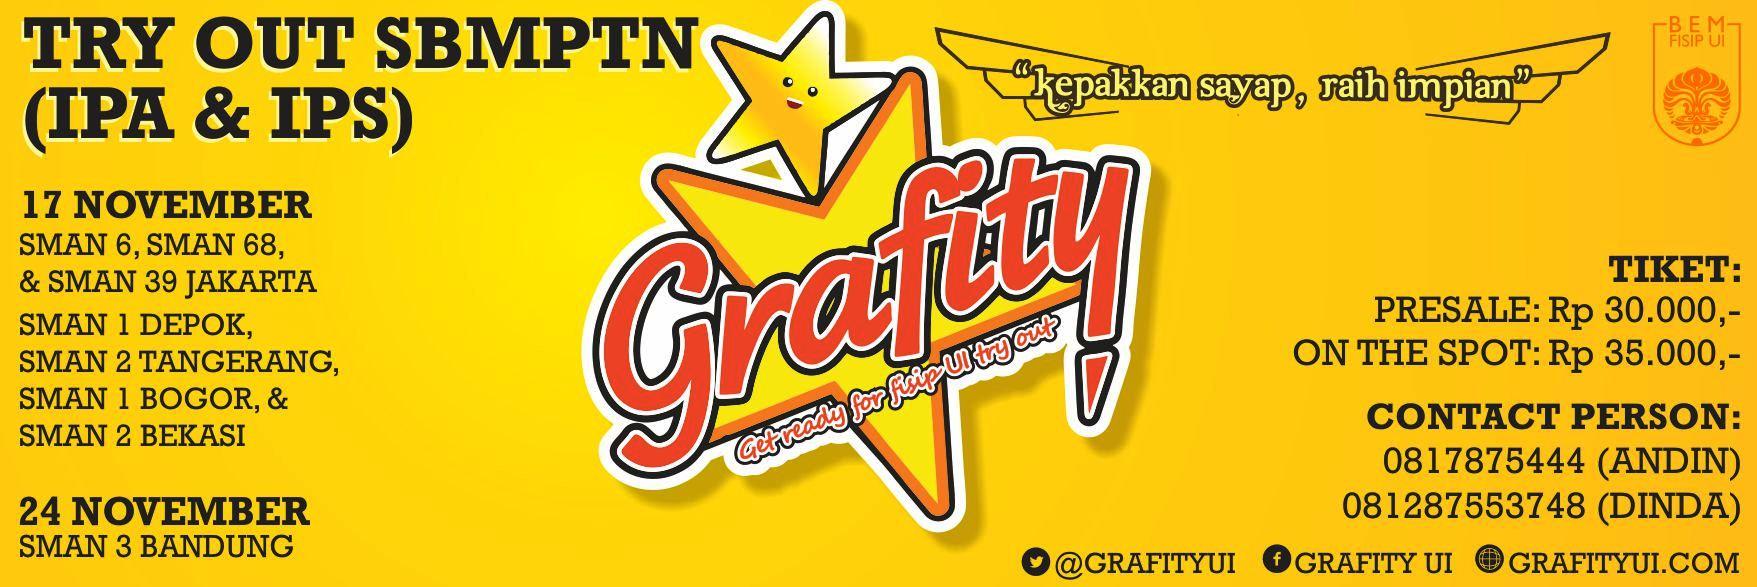 GRAFITY UI 2013 POSTER SOFTCOPY